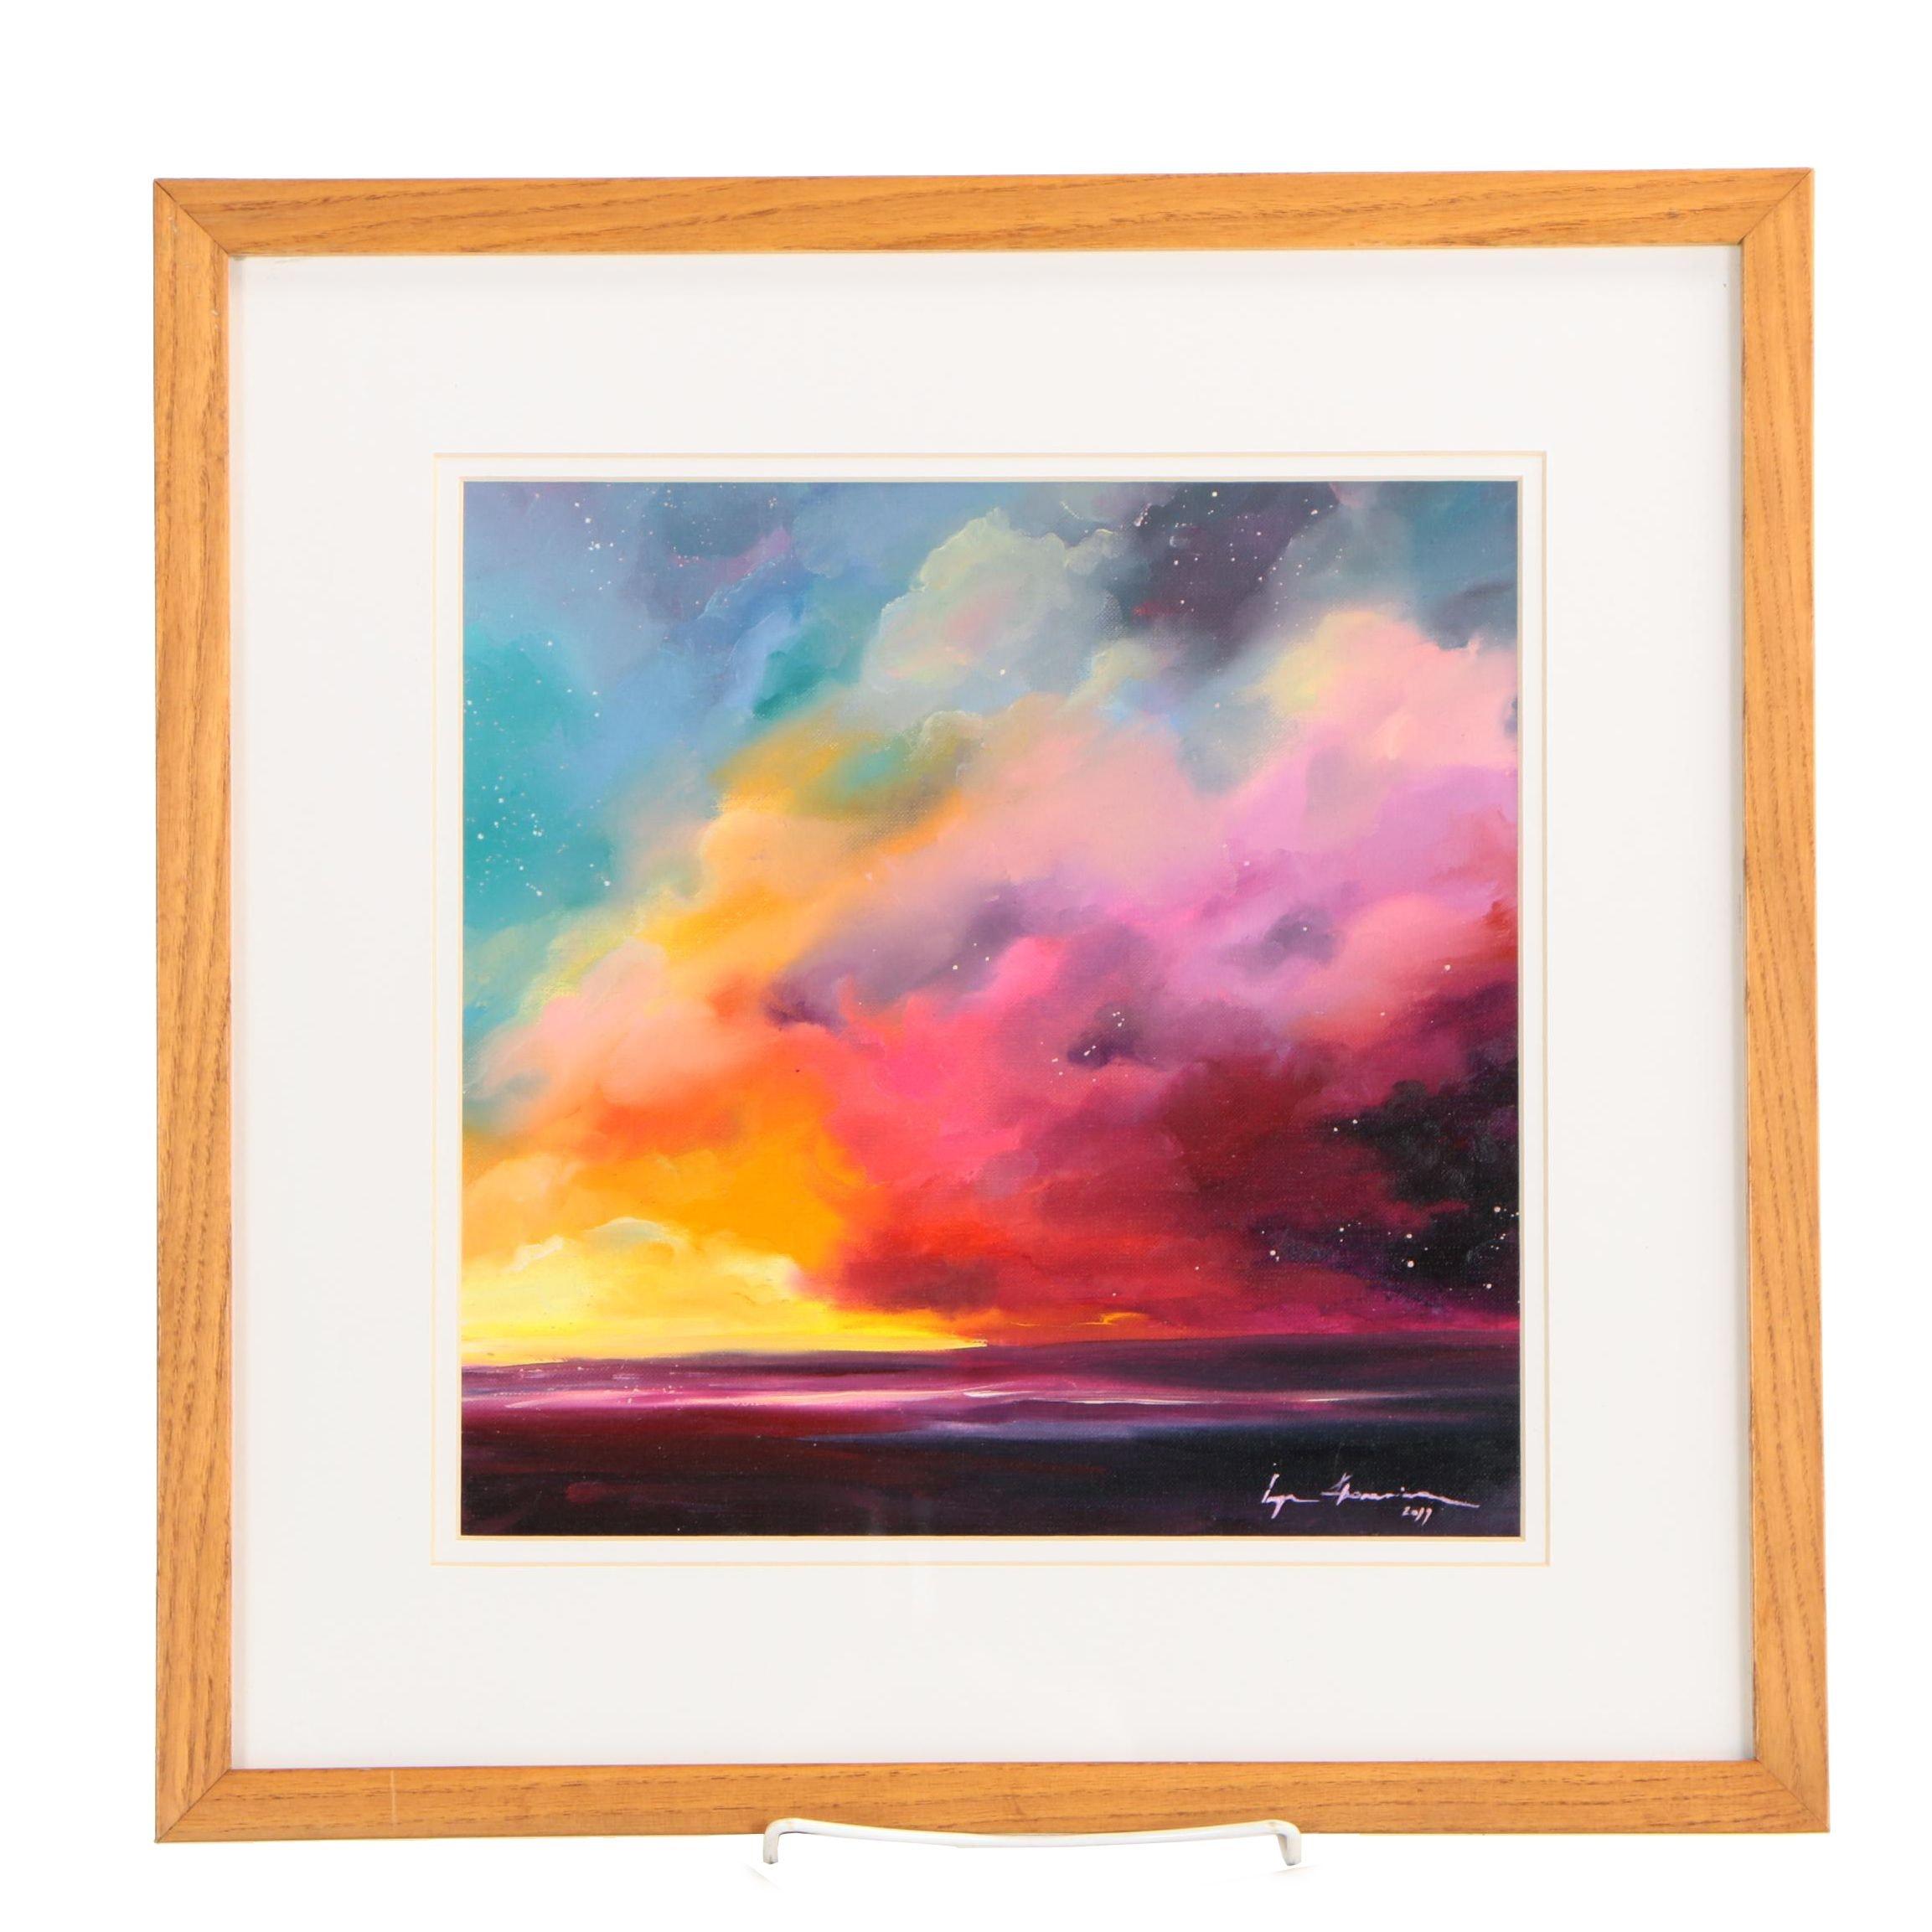 Inga Khanarina Oil Painting of Seascape